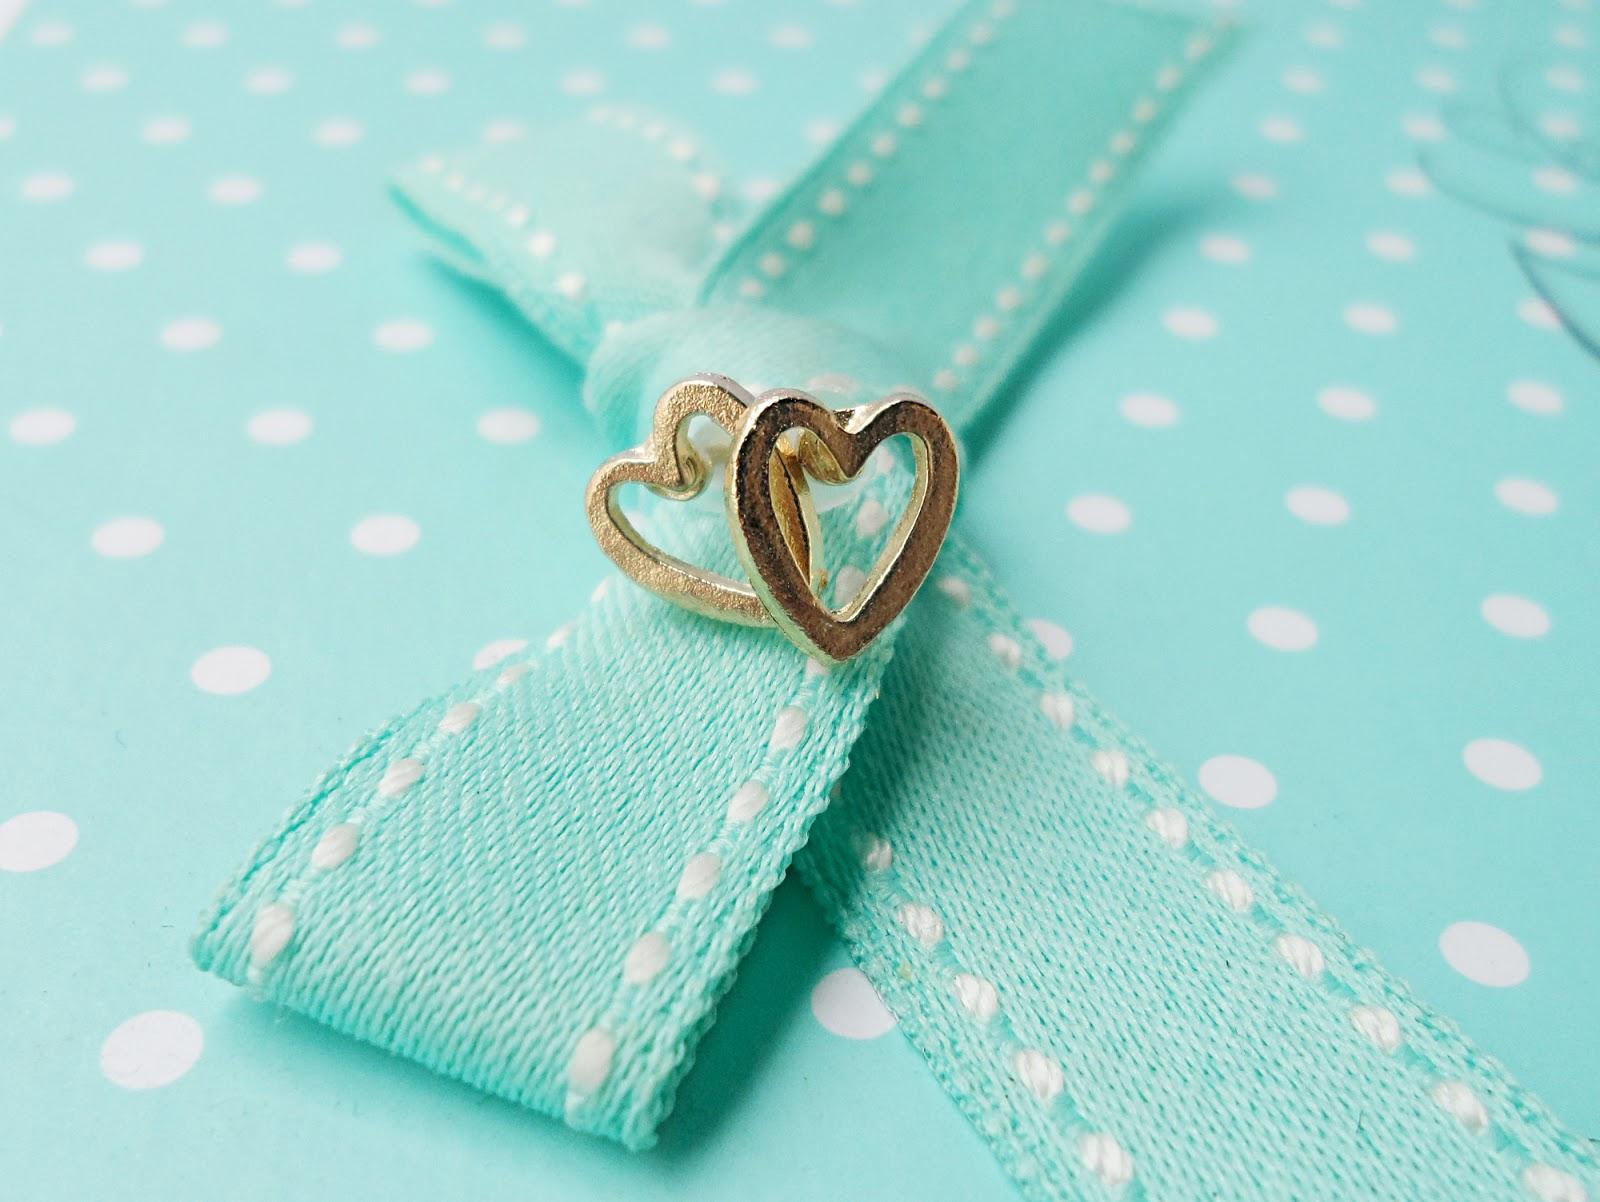 born pretty store jewelry review blogger liz breygel